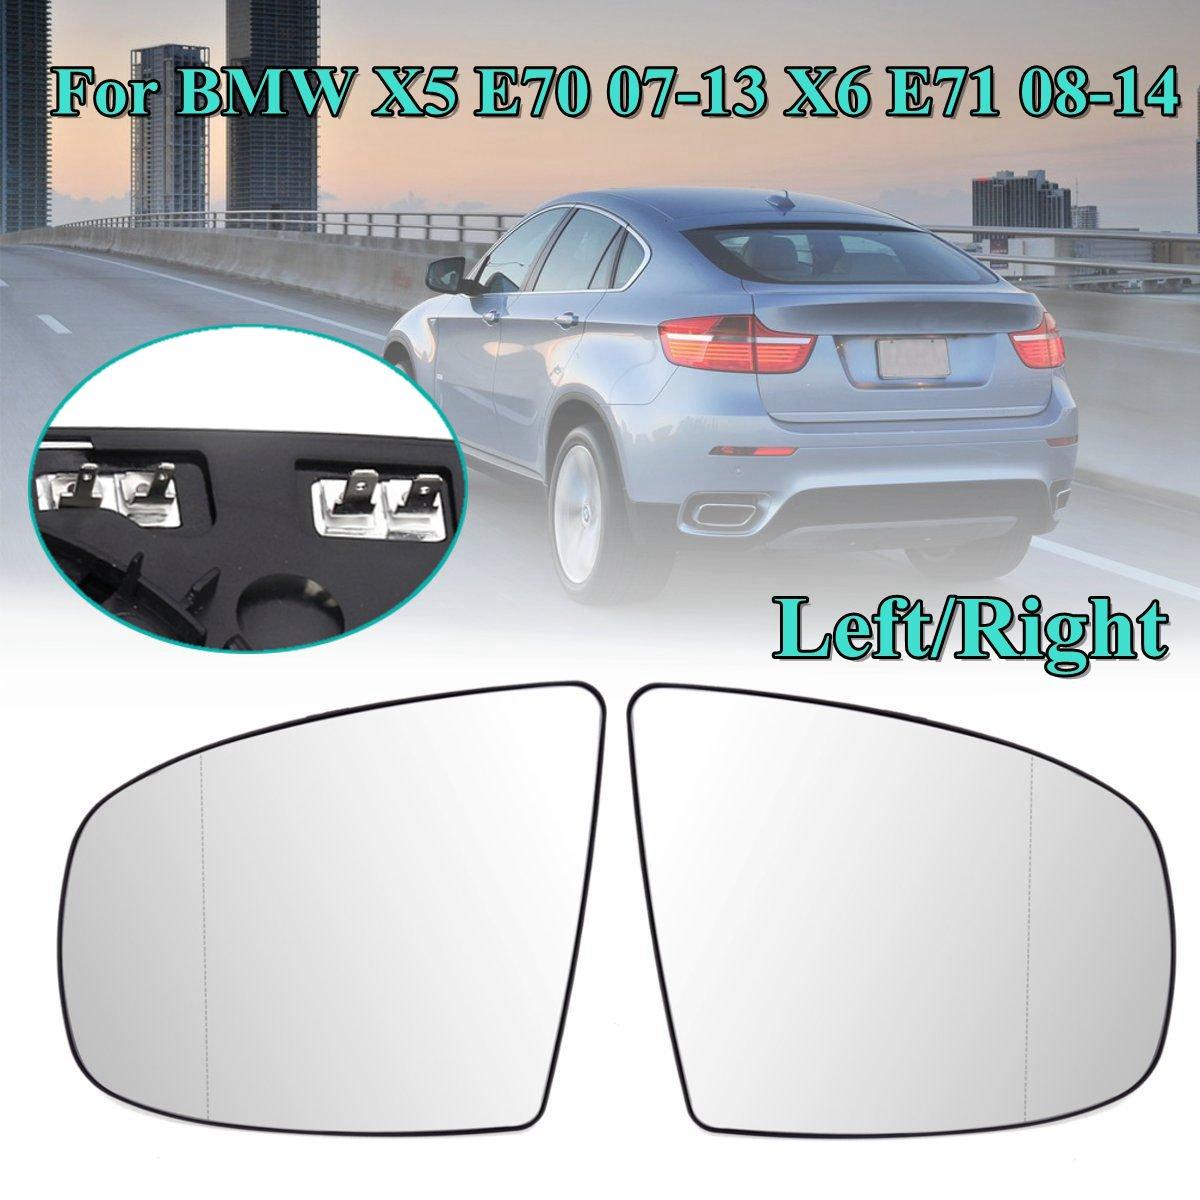 4 interfaz Puerta de ala de espejo con cristal calefactado lado eléctrico ala de espejo de vidrio para BMW X5 E70 07-11 X6 E71 2008, 2009, 2010-2014